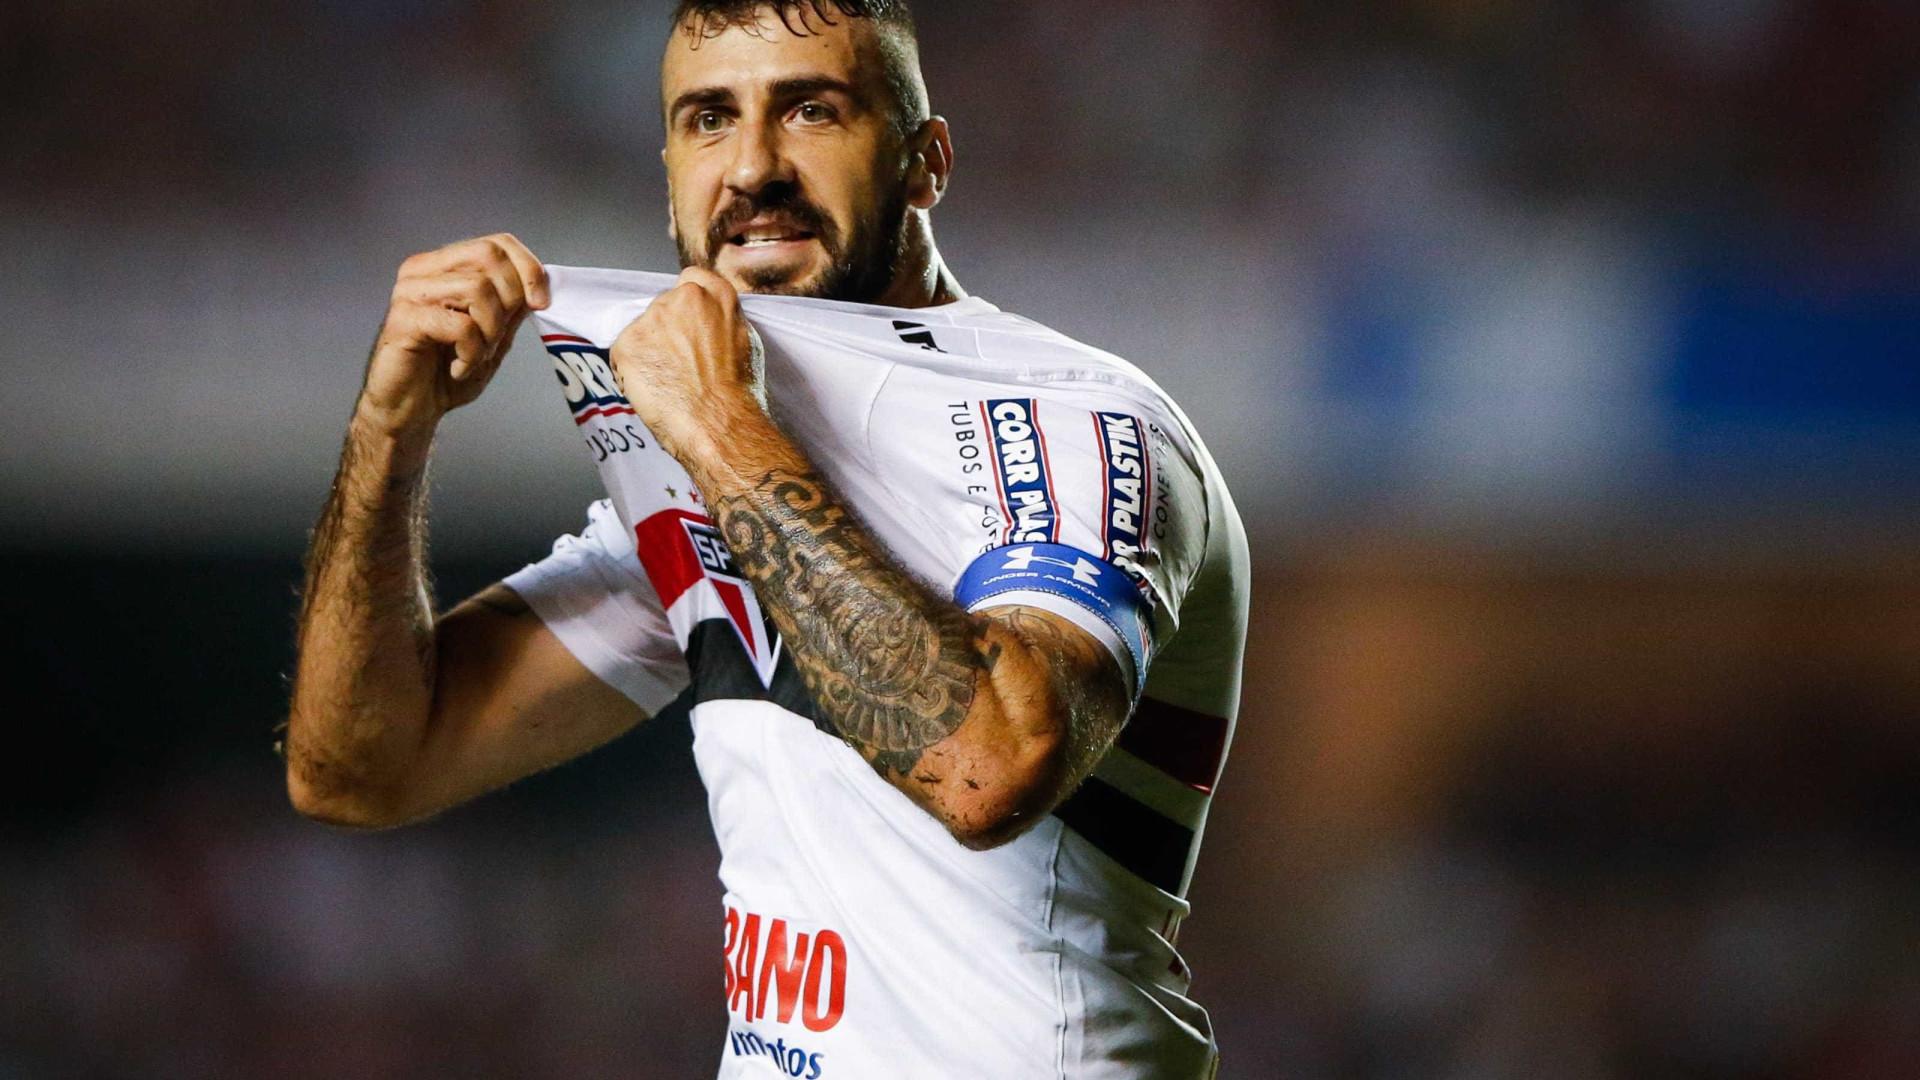 Presidente do River Plate prepara proposta para Pratto